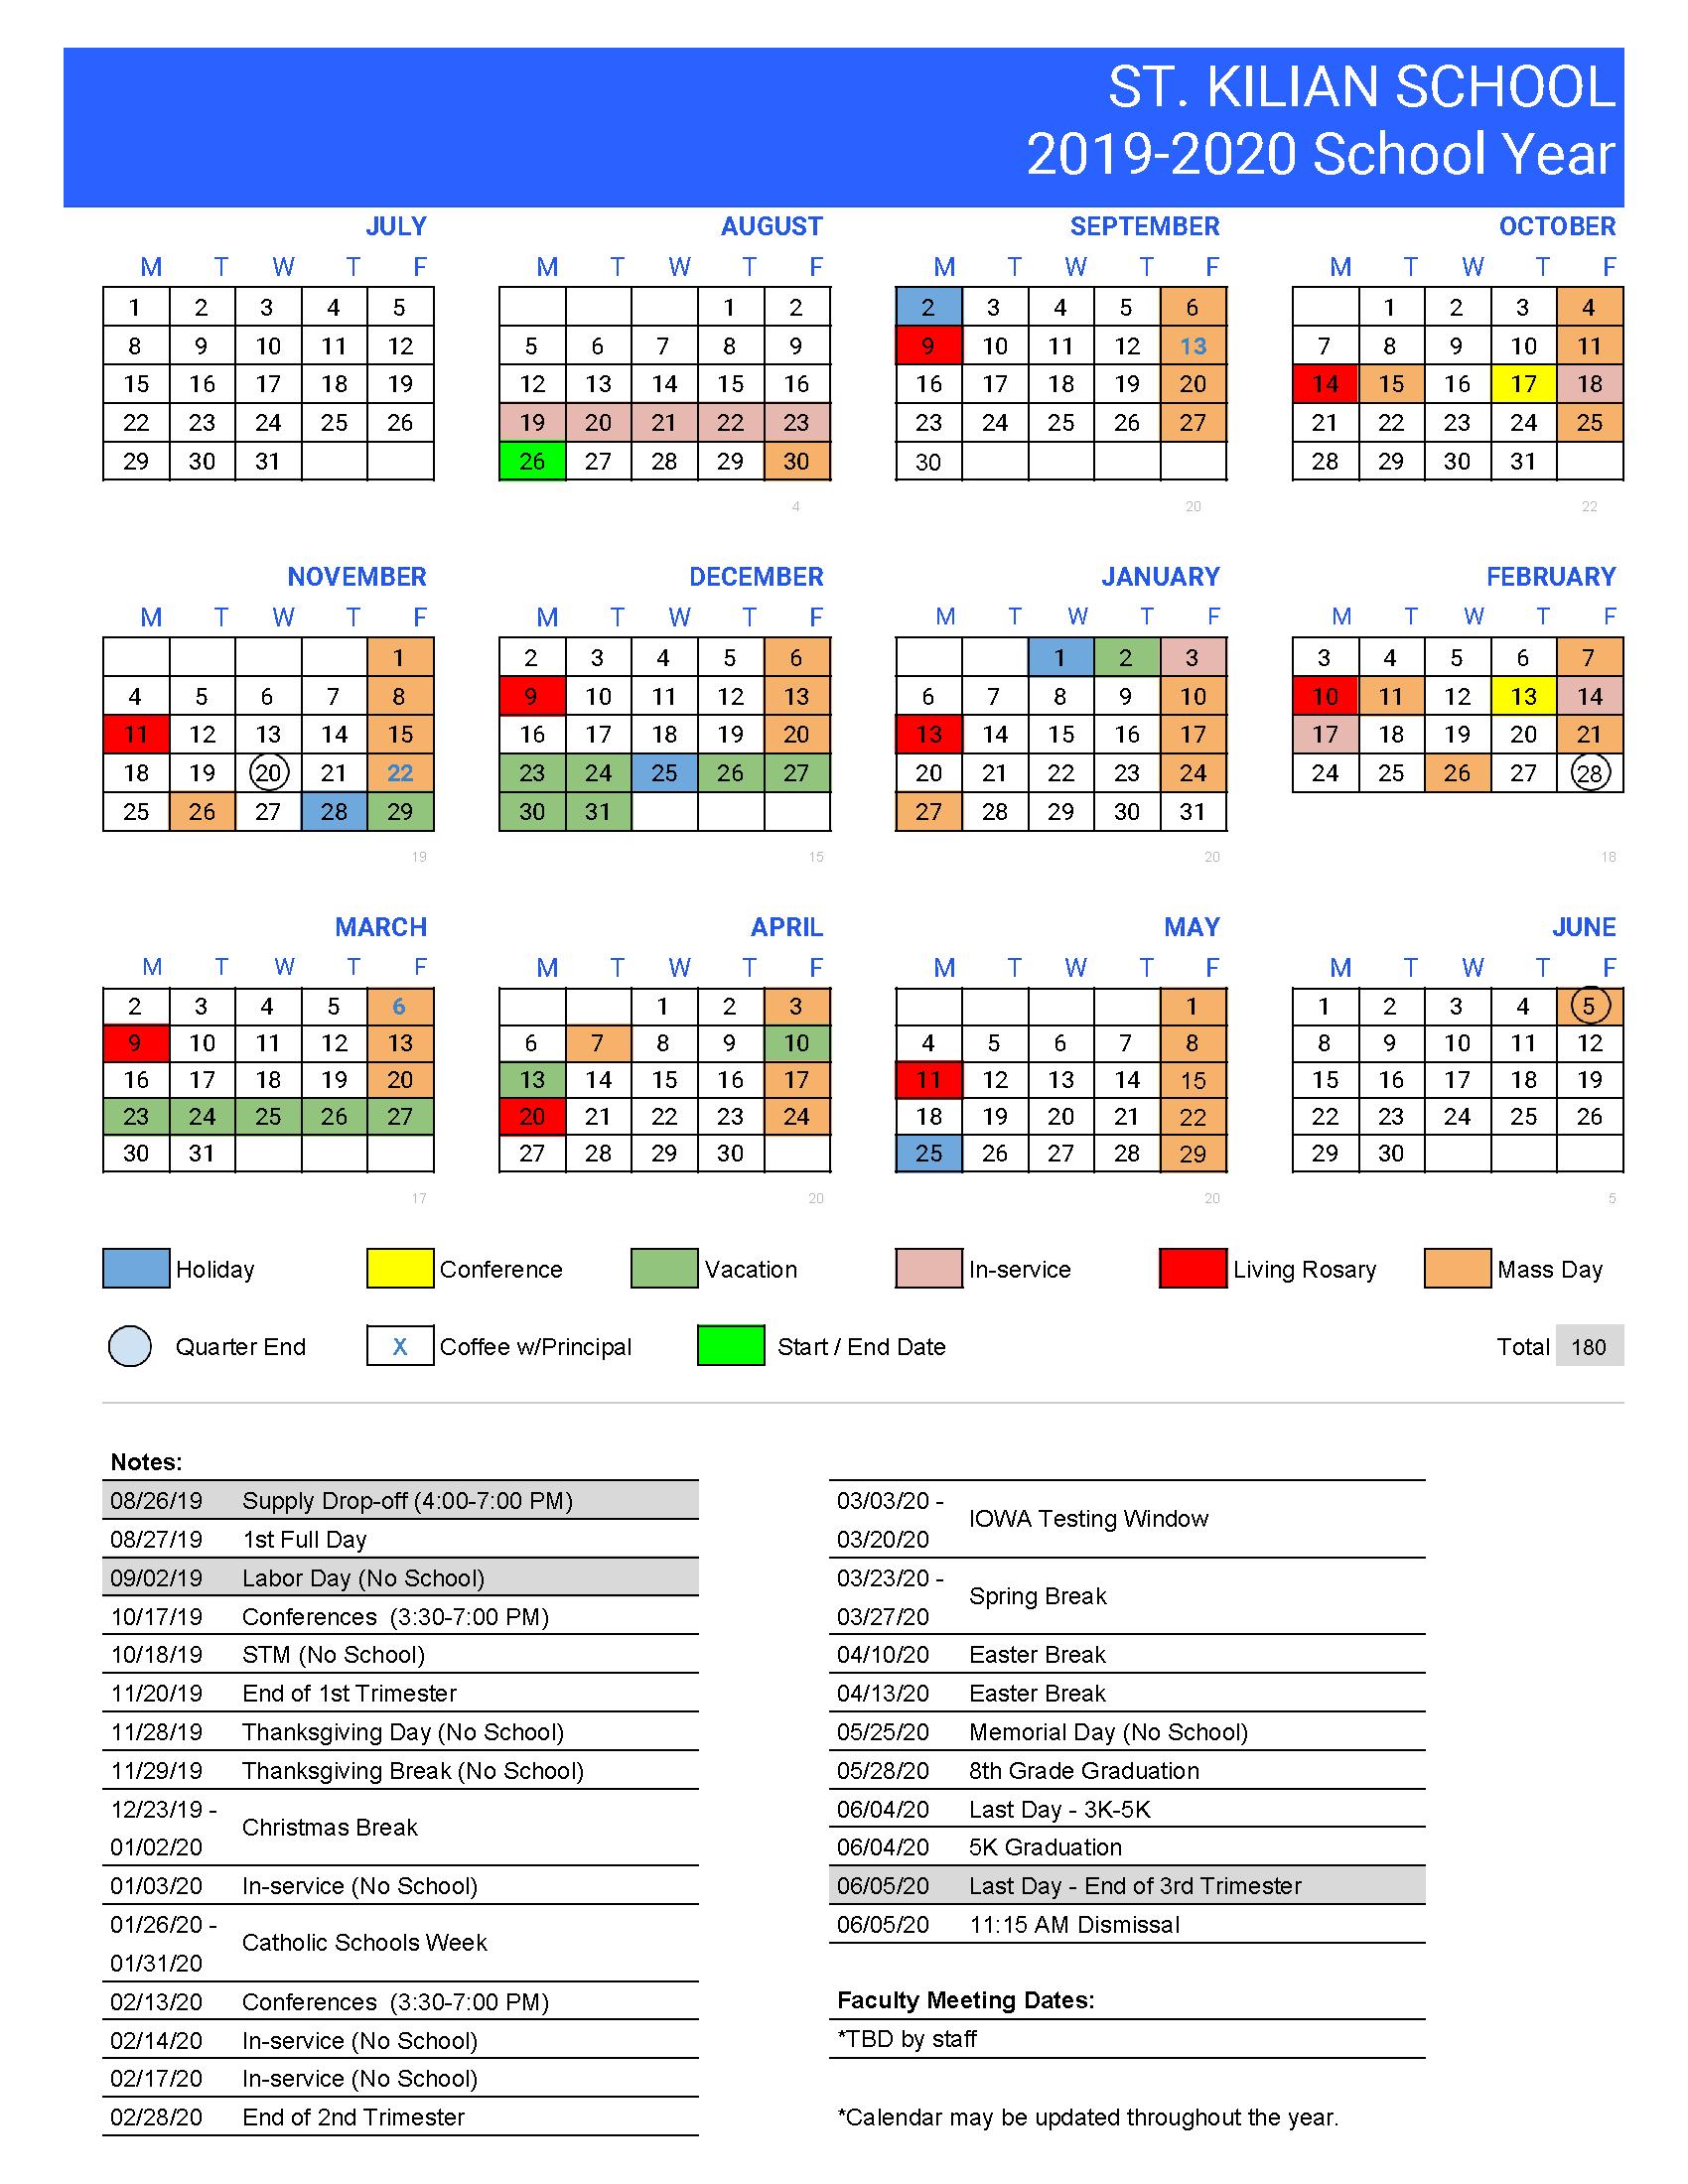 Las Cruces Isd Calendar | Printable Calendar 2020 2021 With Fort Worth Isd Calendar 2021